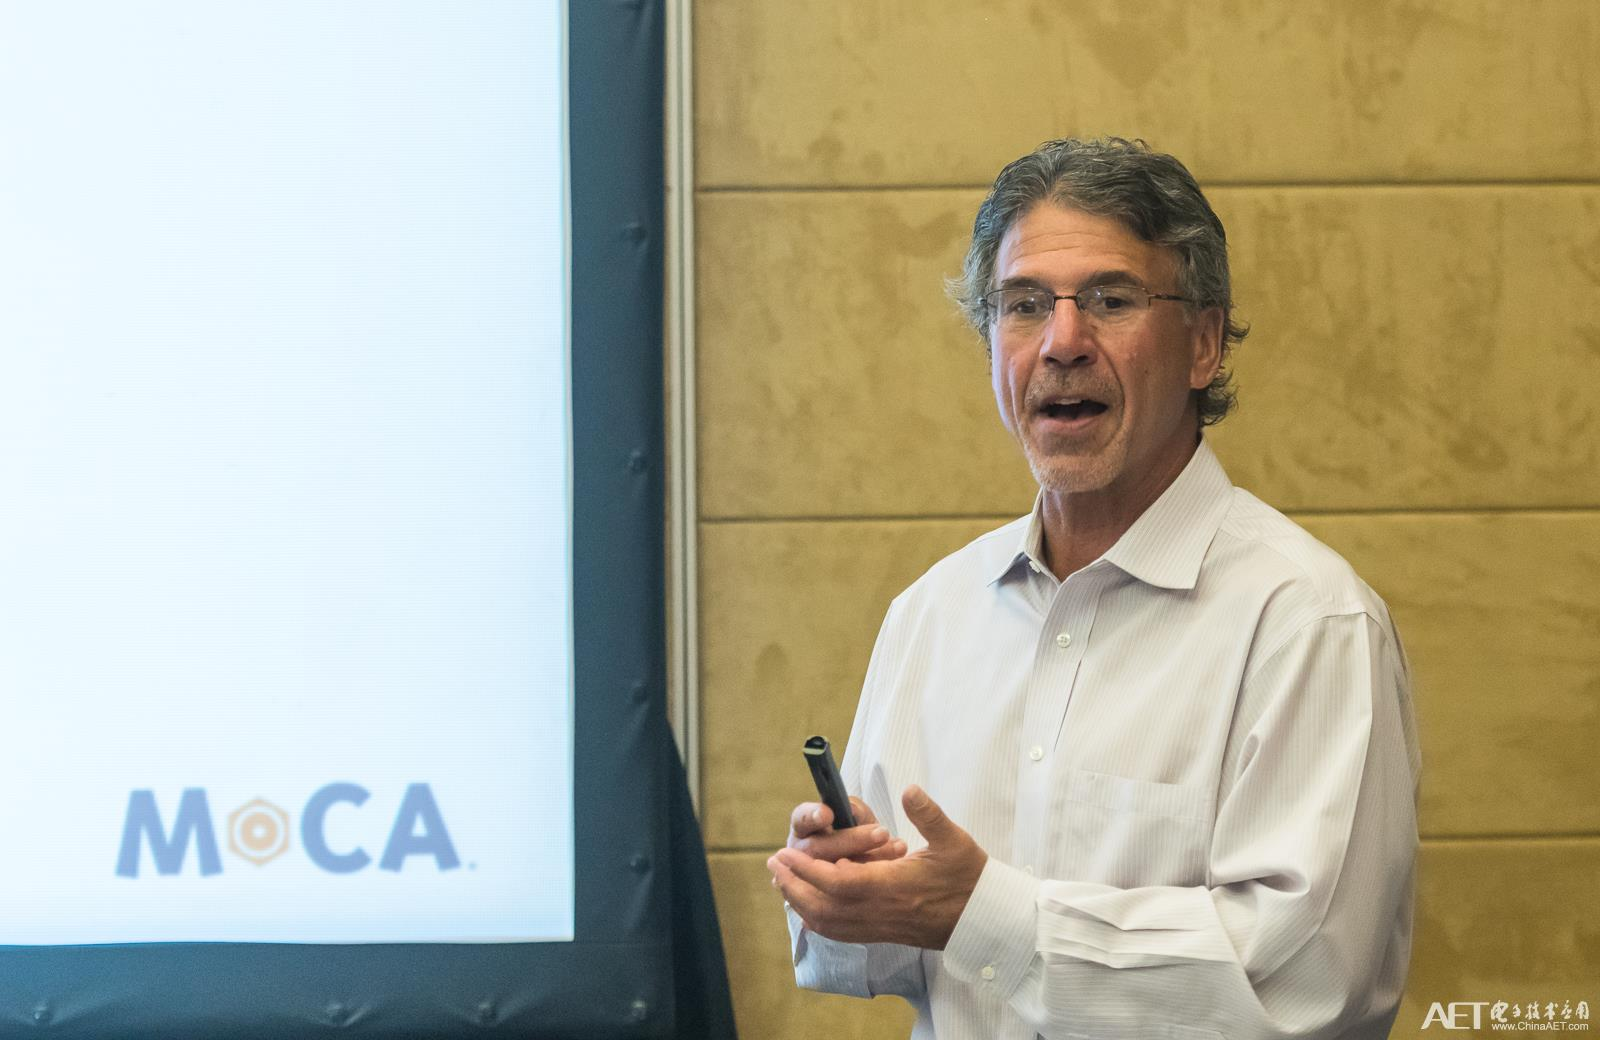 MoCA联盟市场营销及会员关系副总裁 Rob Gelphman 2.jpg